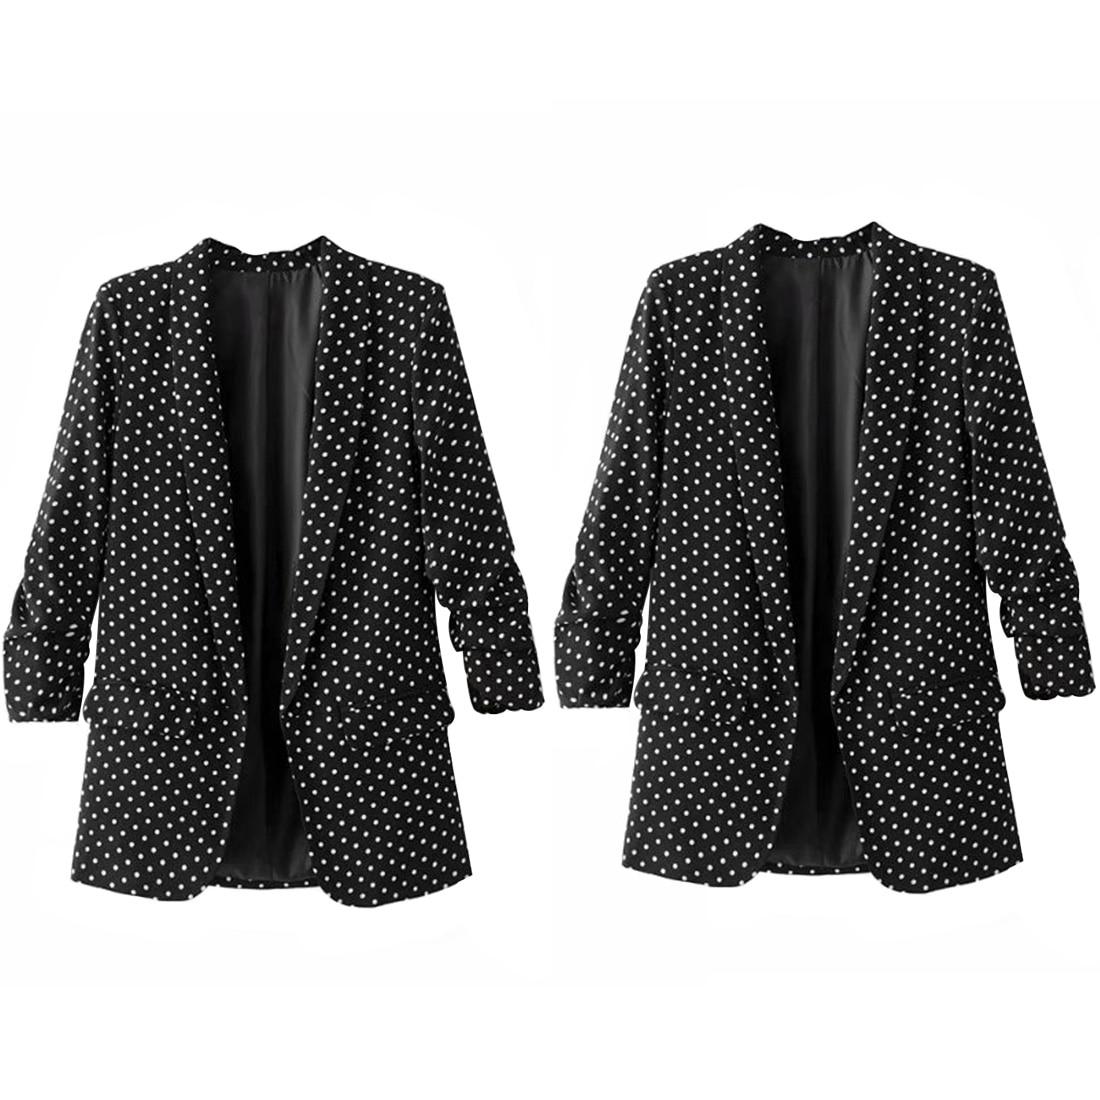 Charming 2017 Women Polka Dot Blazer Padded Shoulder Notched Collar Long Sleeve Coat Casual Outerwear Casaco Feminine Tops